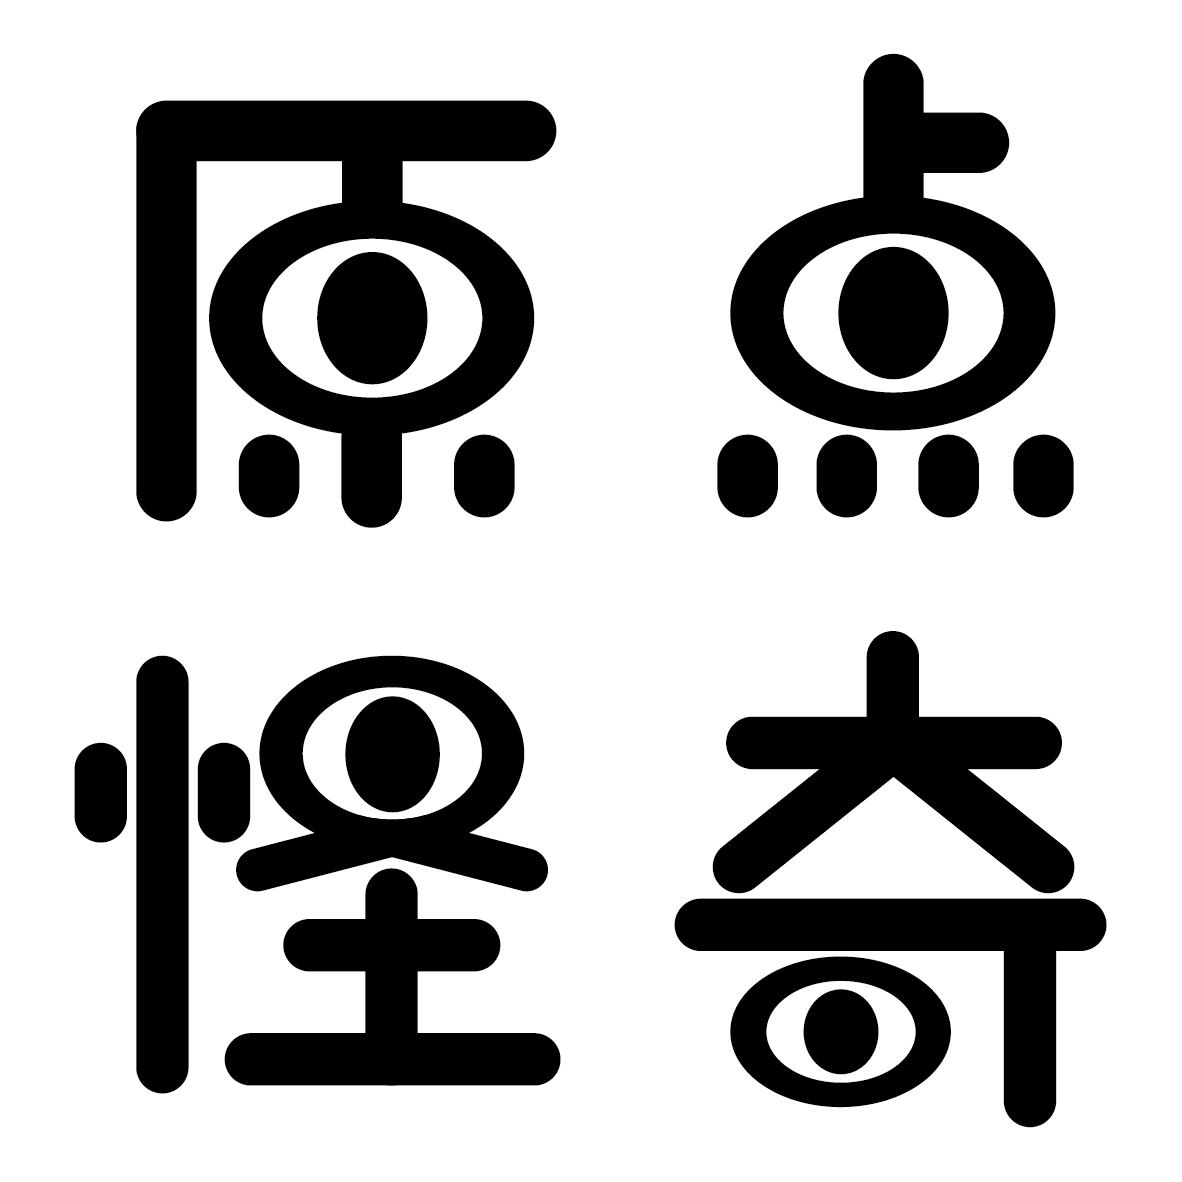 第26回秋祭/慶應義塾大学湘南藤沢キャンパス